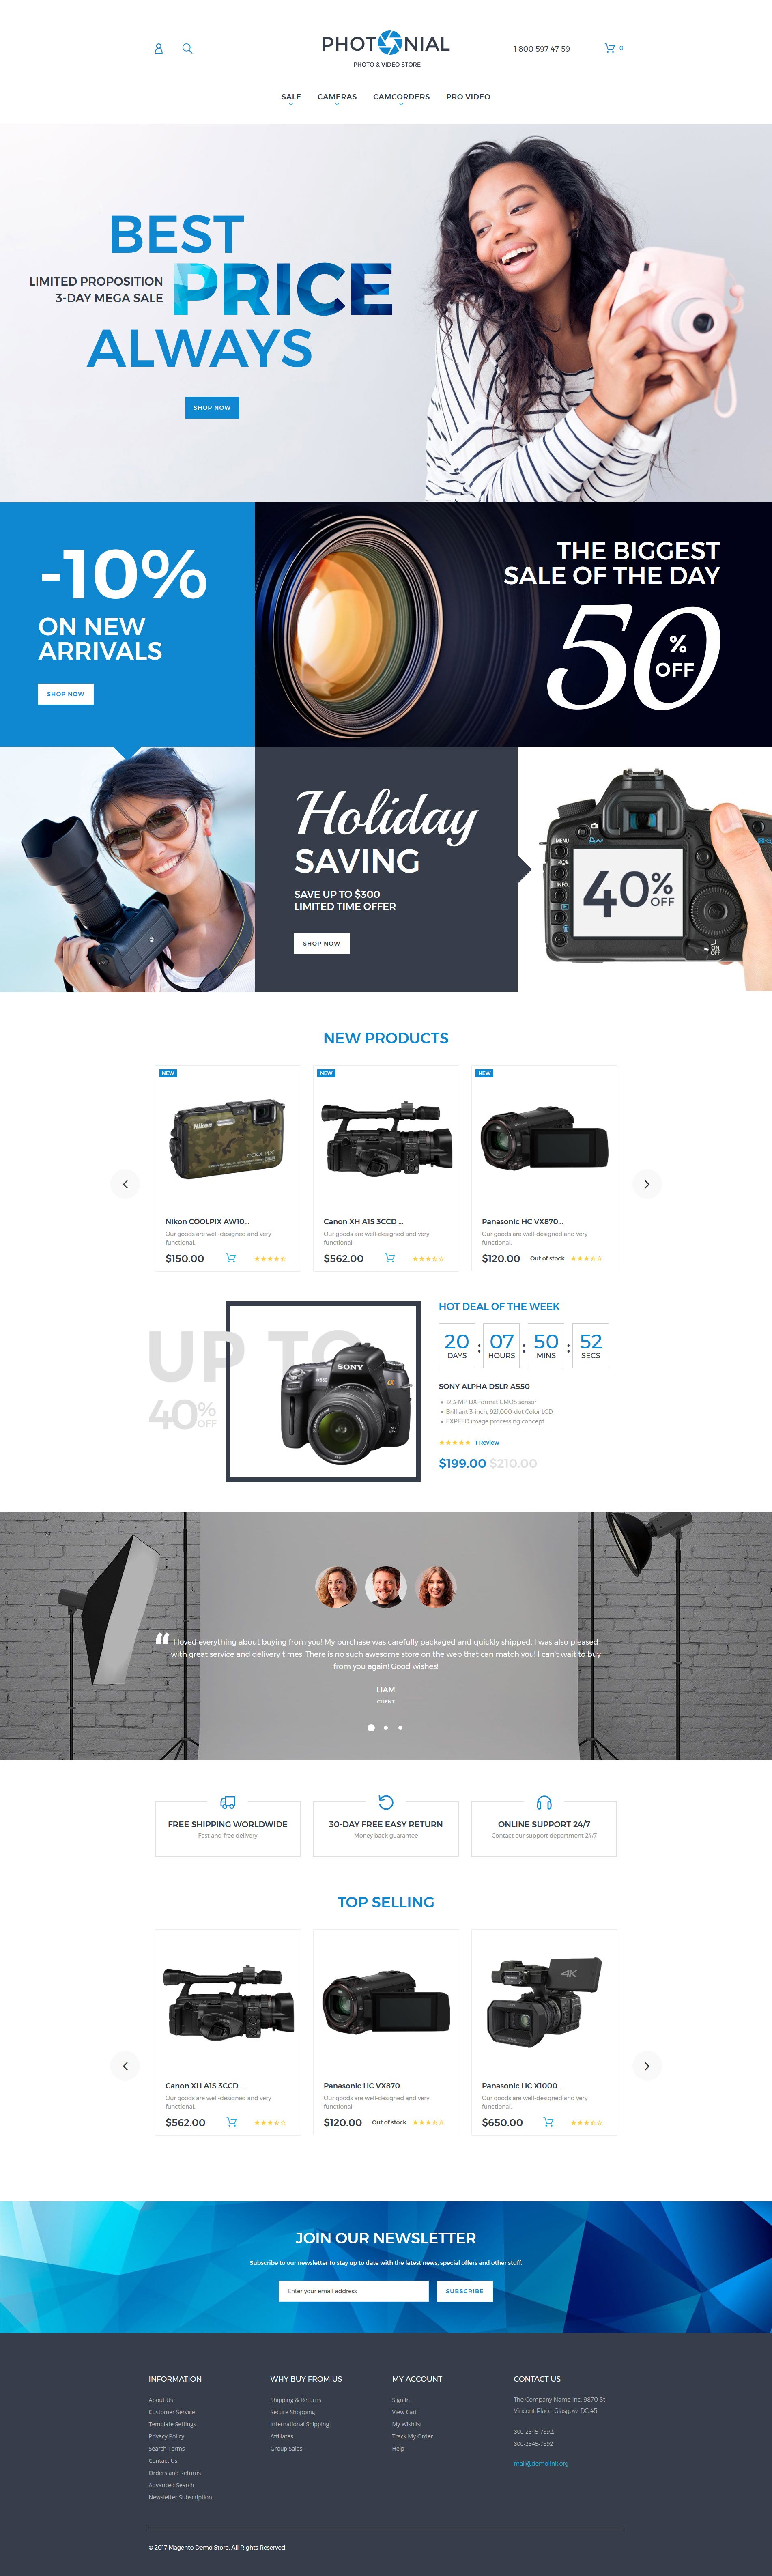 "Magento Theme namens ""Photonial - Photo & Video Store"" #62097 - Screenshot"